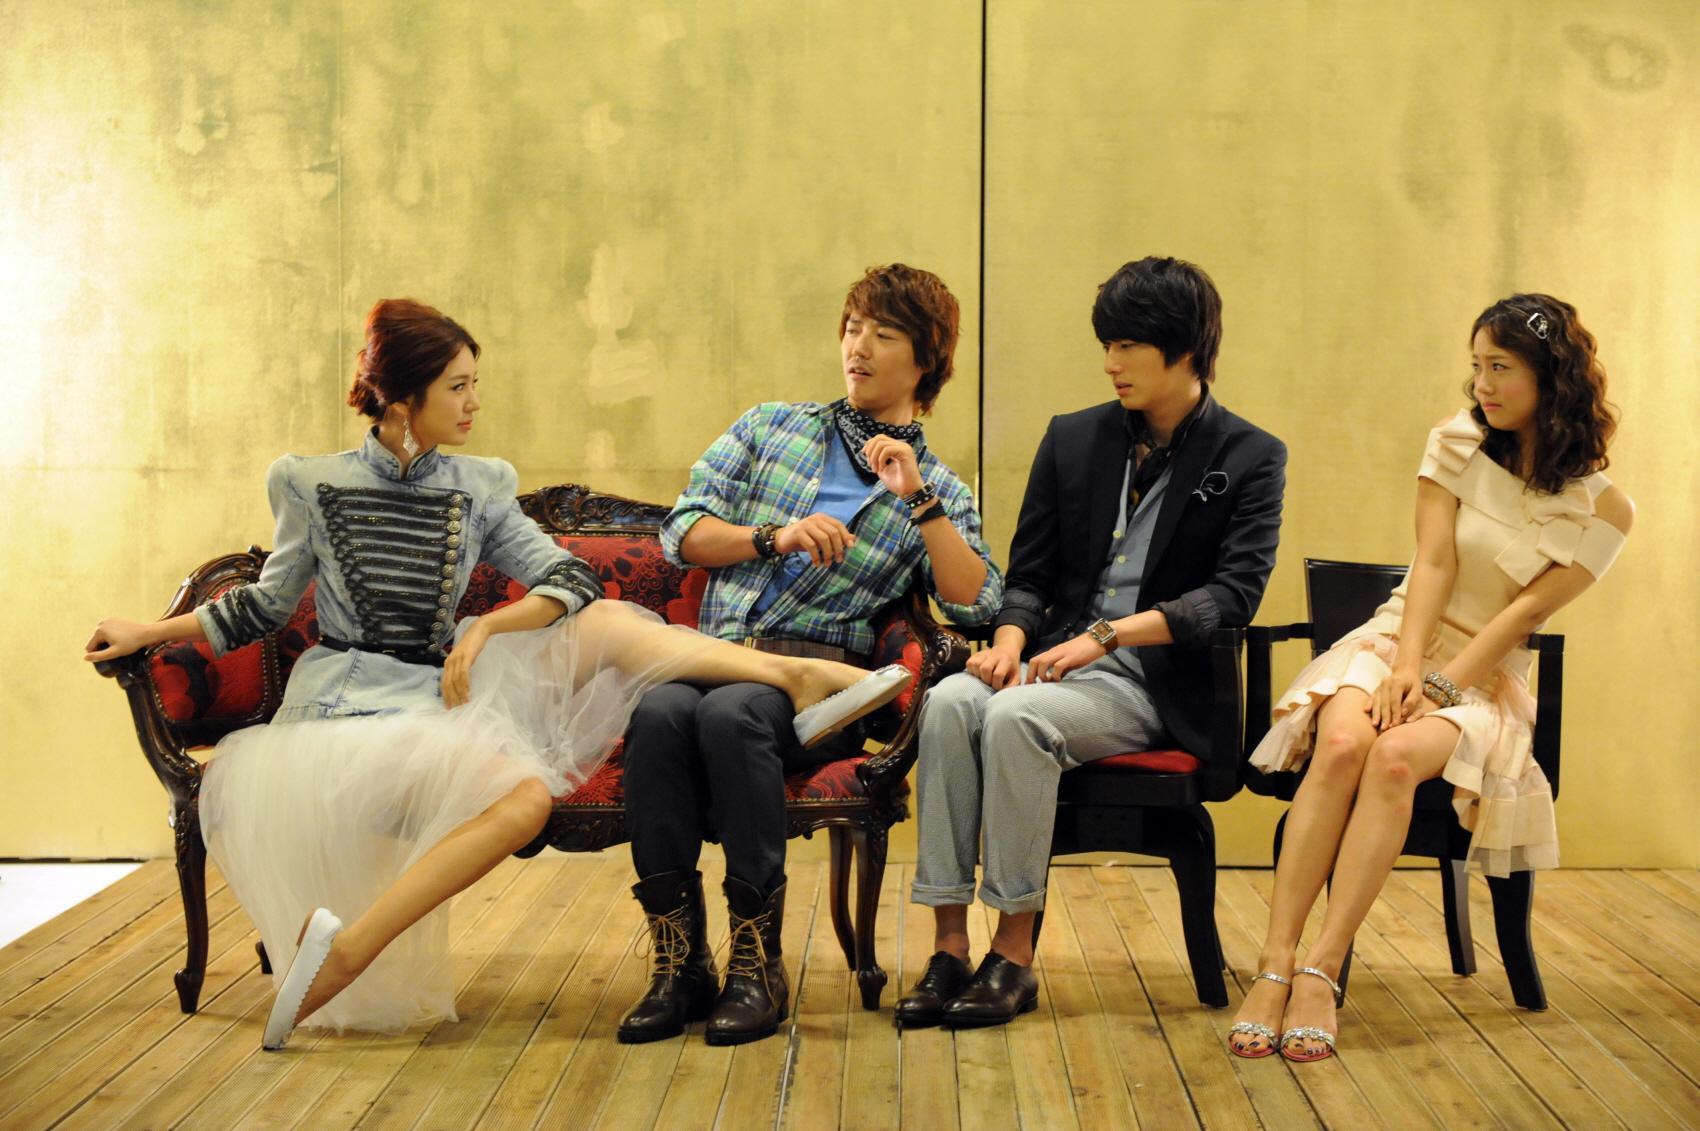 http://korean-cute.sosugary.com/albums/userpics/10001/12489267391862808694.jpg